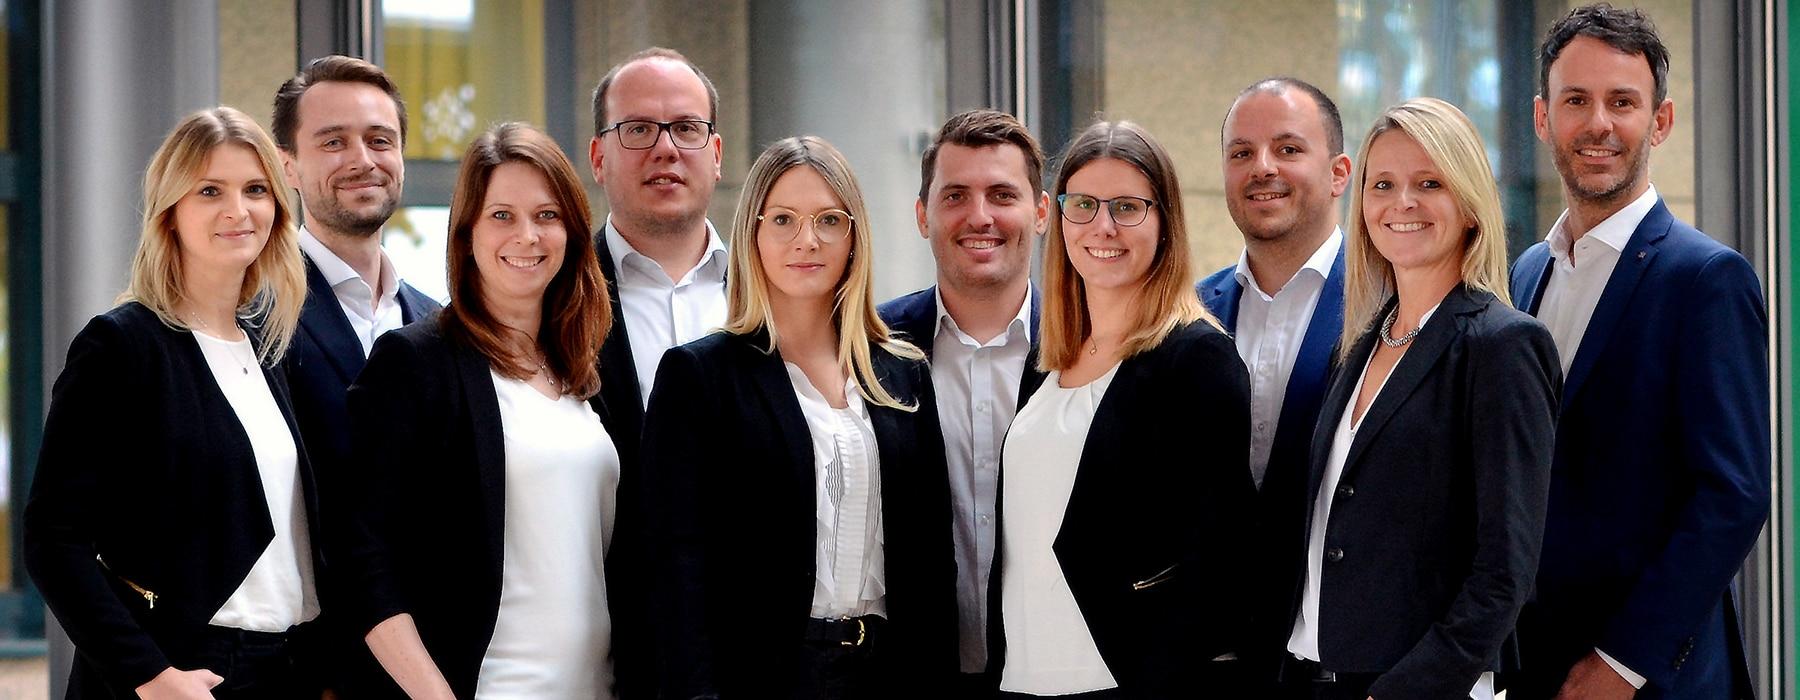 team-bautraeger1